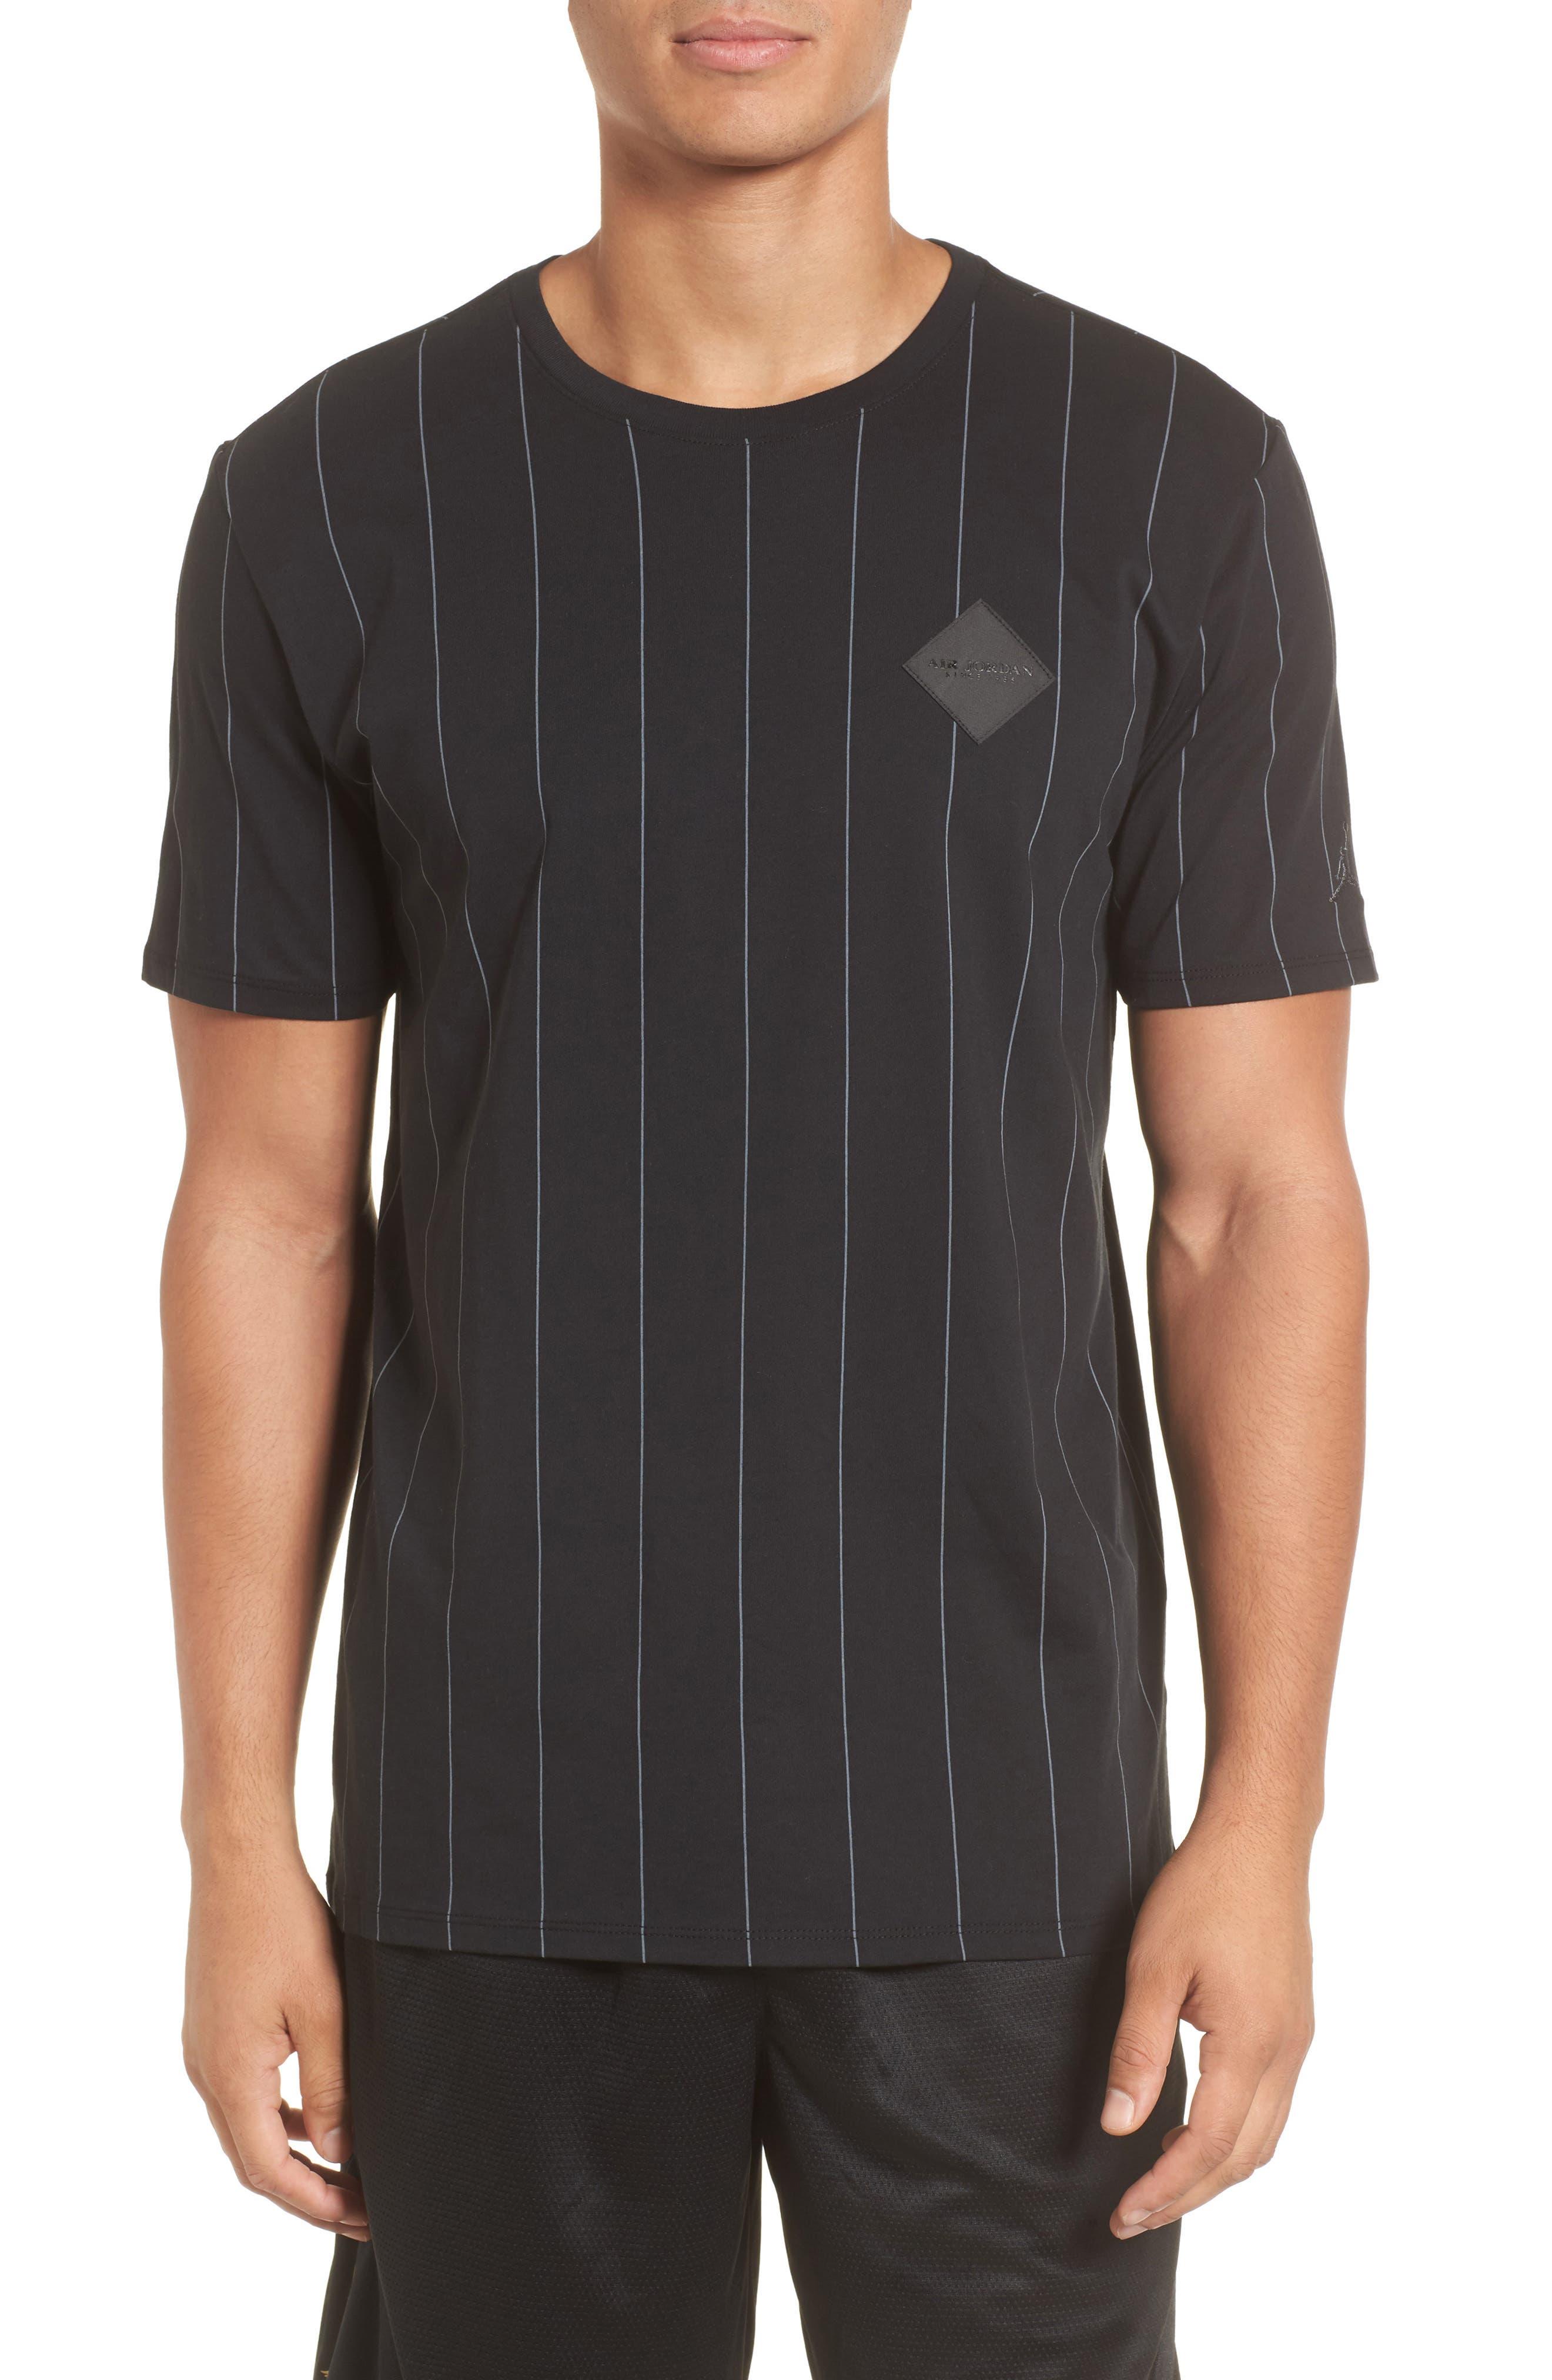 Nike Jordan Sportswear AJ 9 T-Shirt